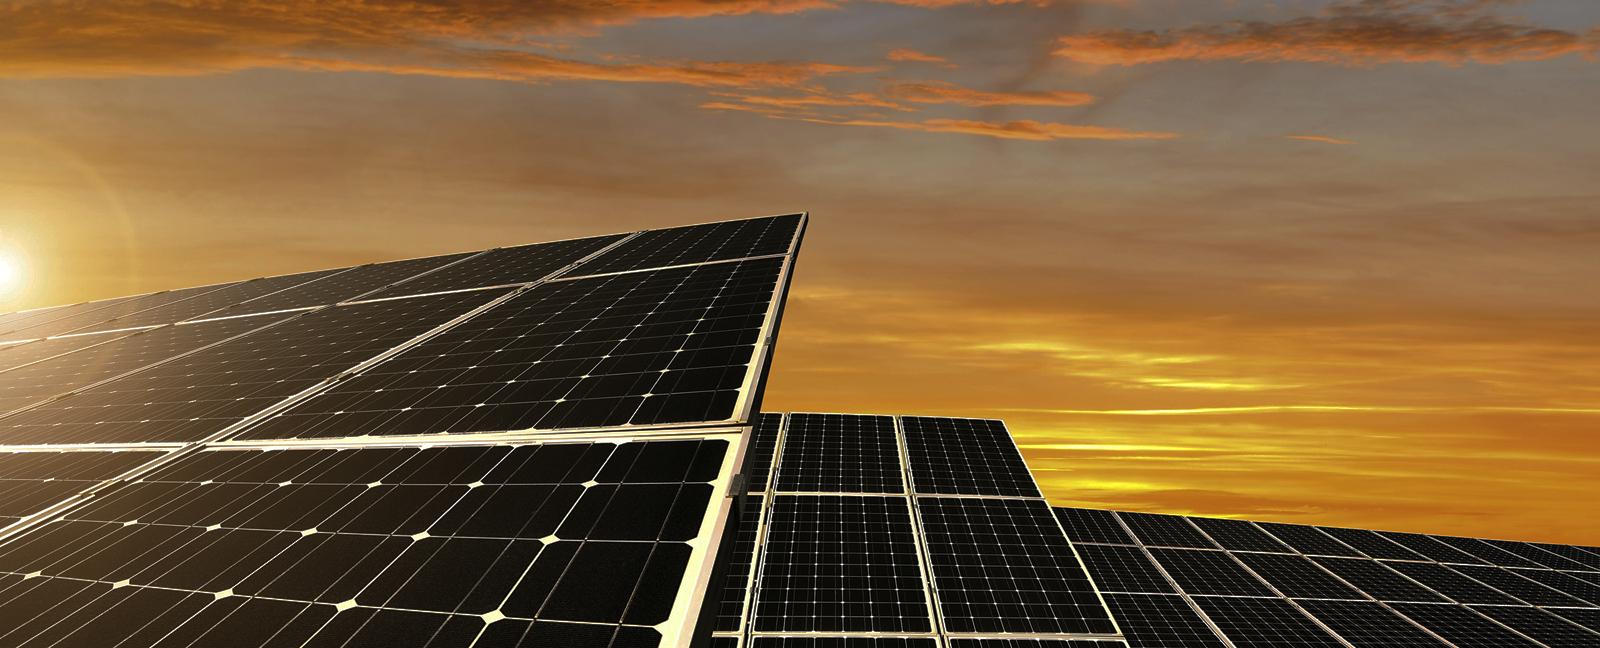 Solar panels, sunset. Photo credit: vencavolrab / iStock